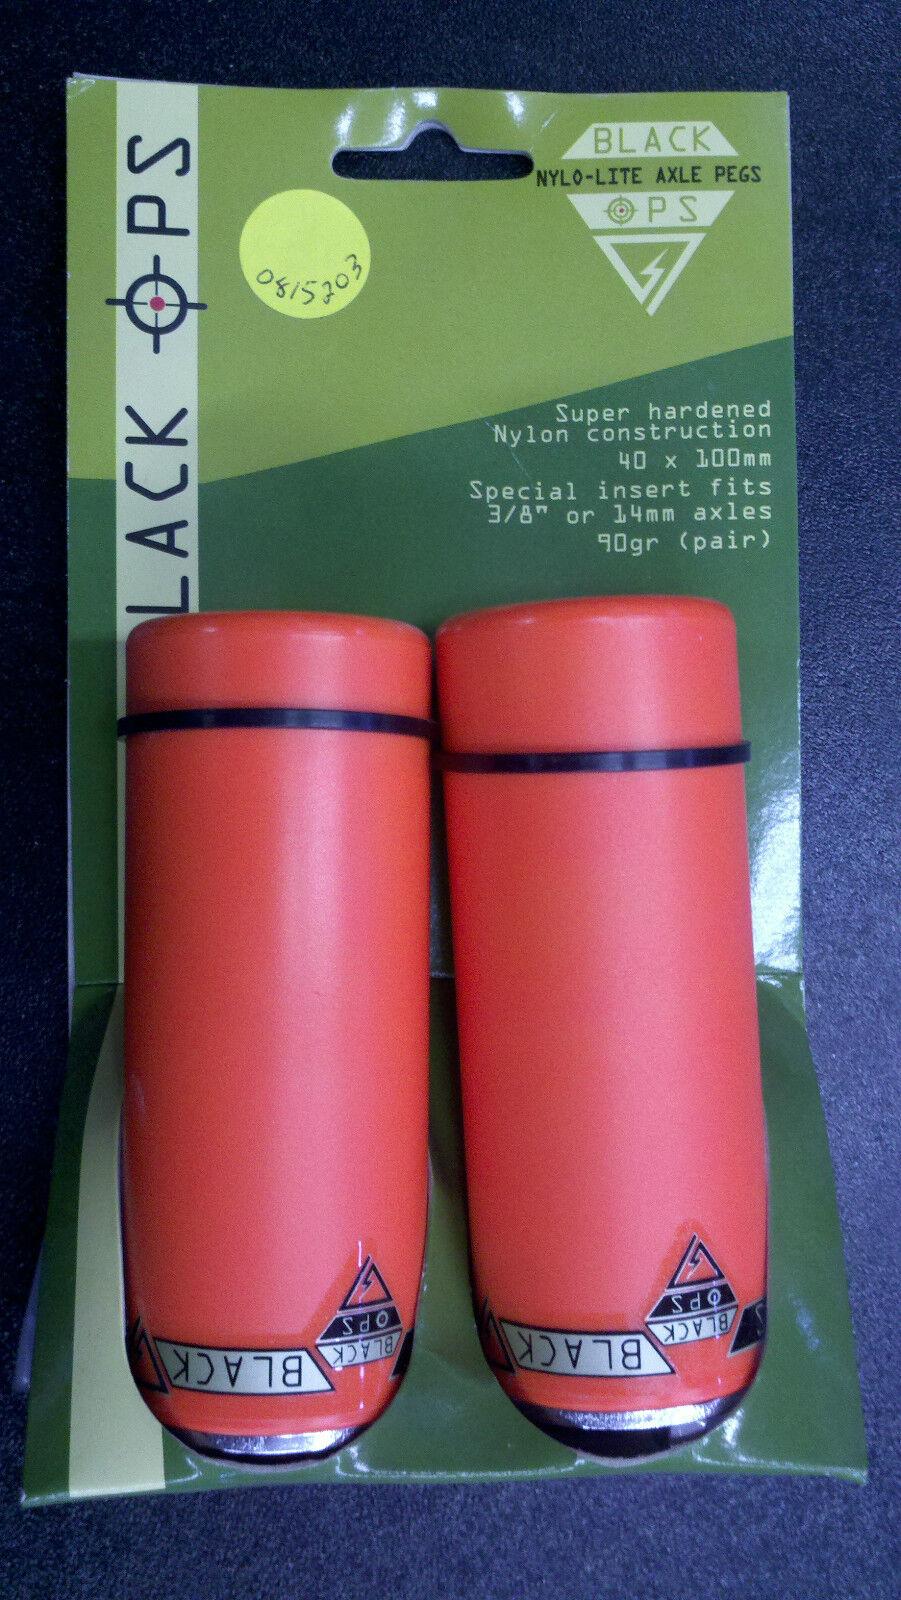 Black Ops BMX NyloLite Axle Pegs WHITE 3//8 or 14mm axle-super hard nylon